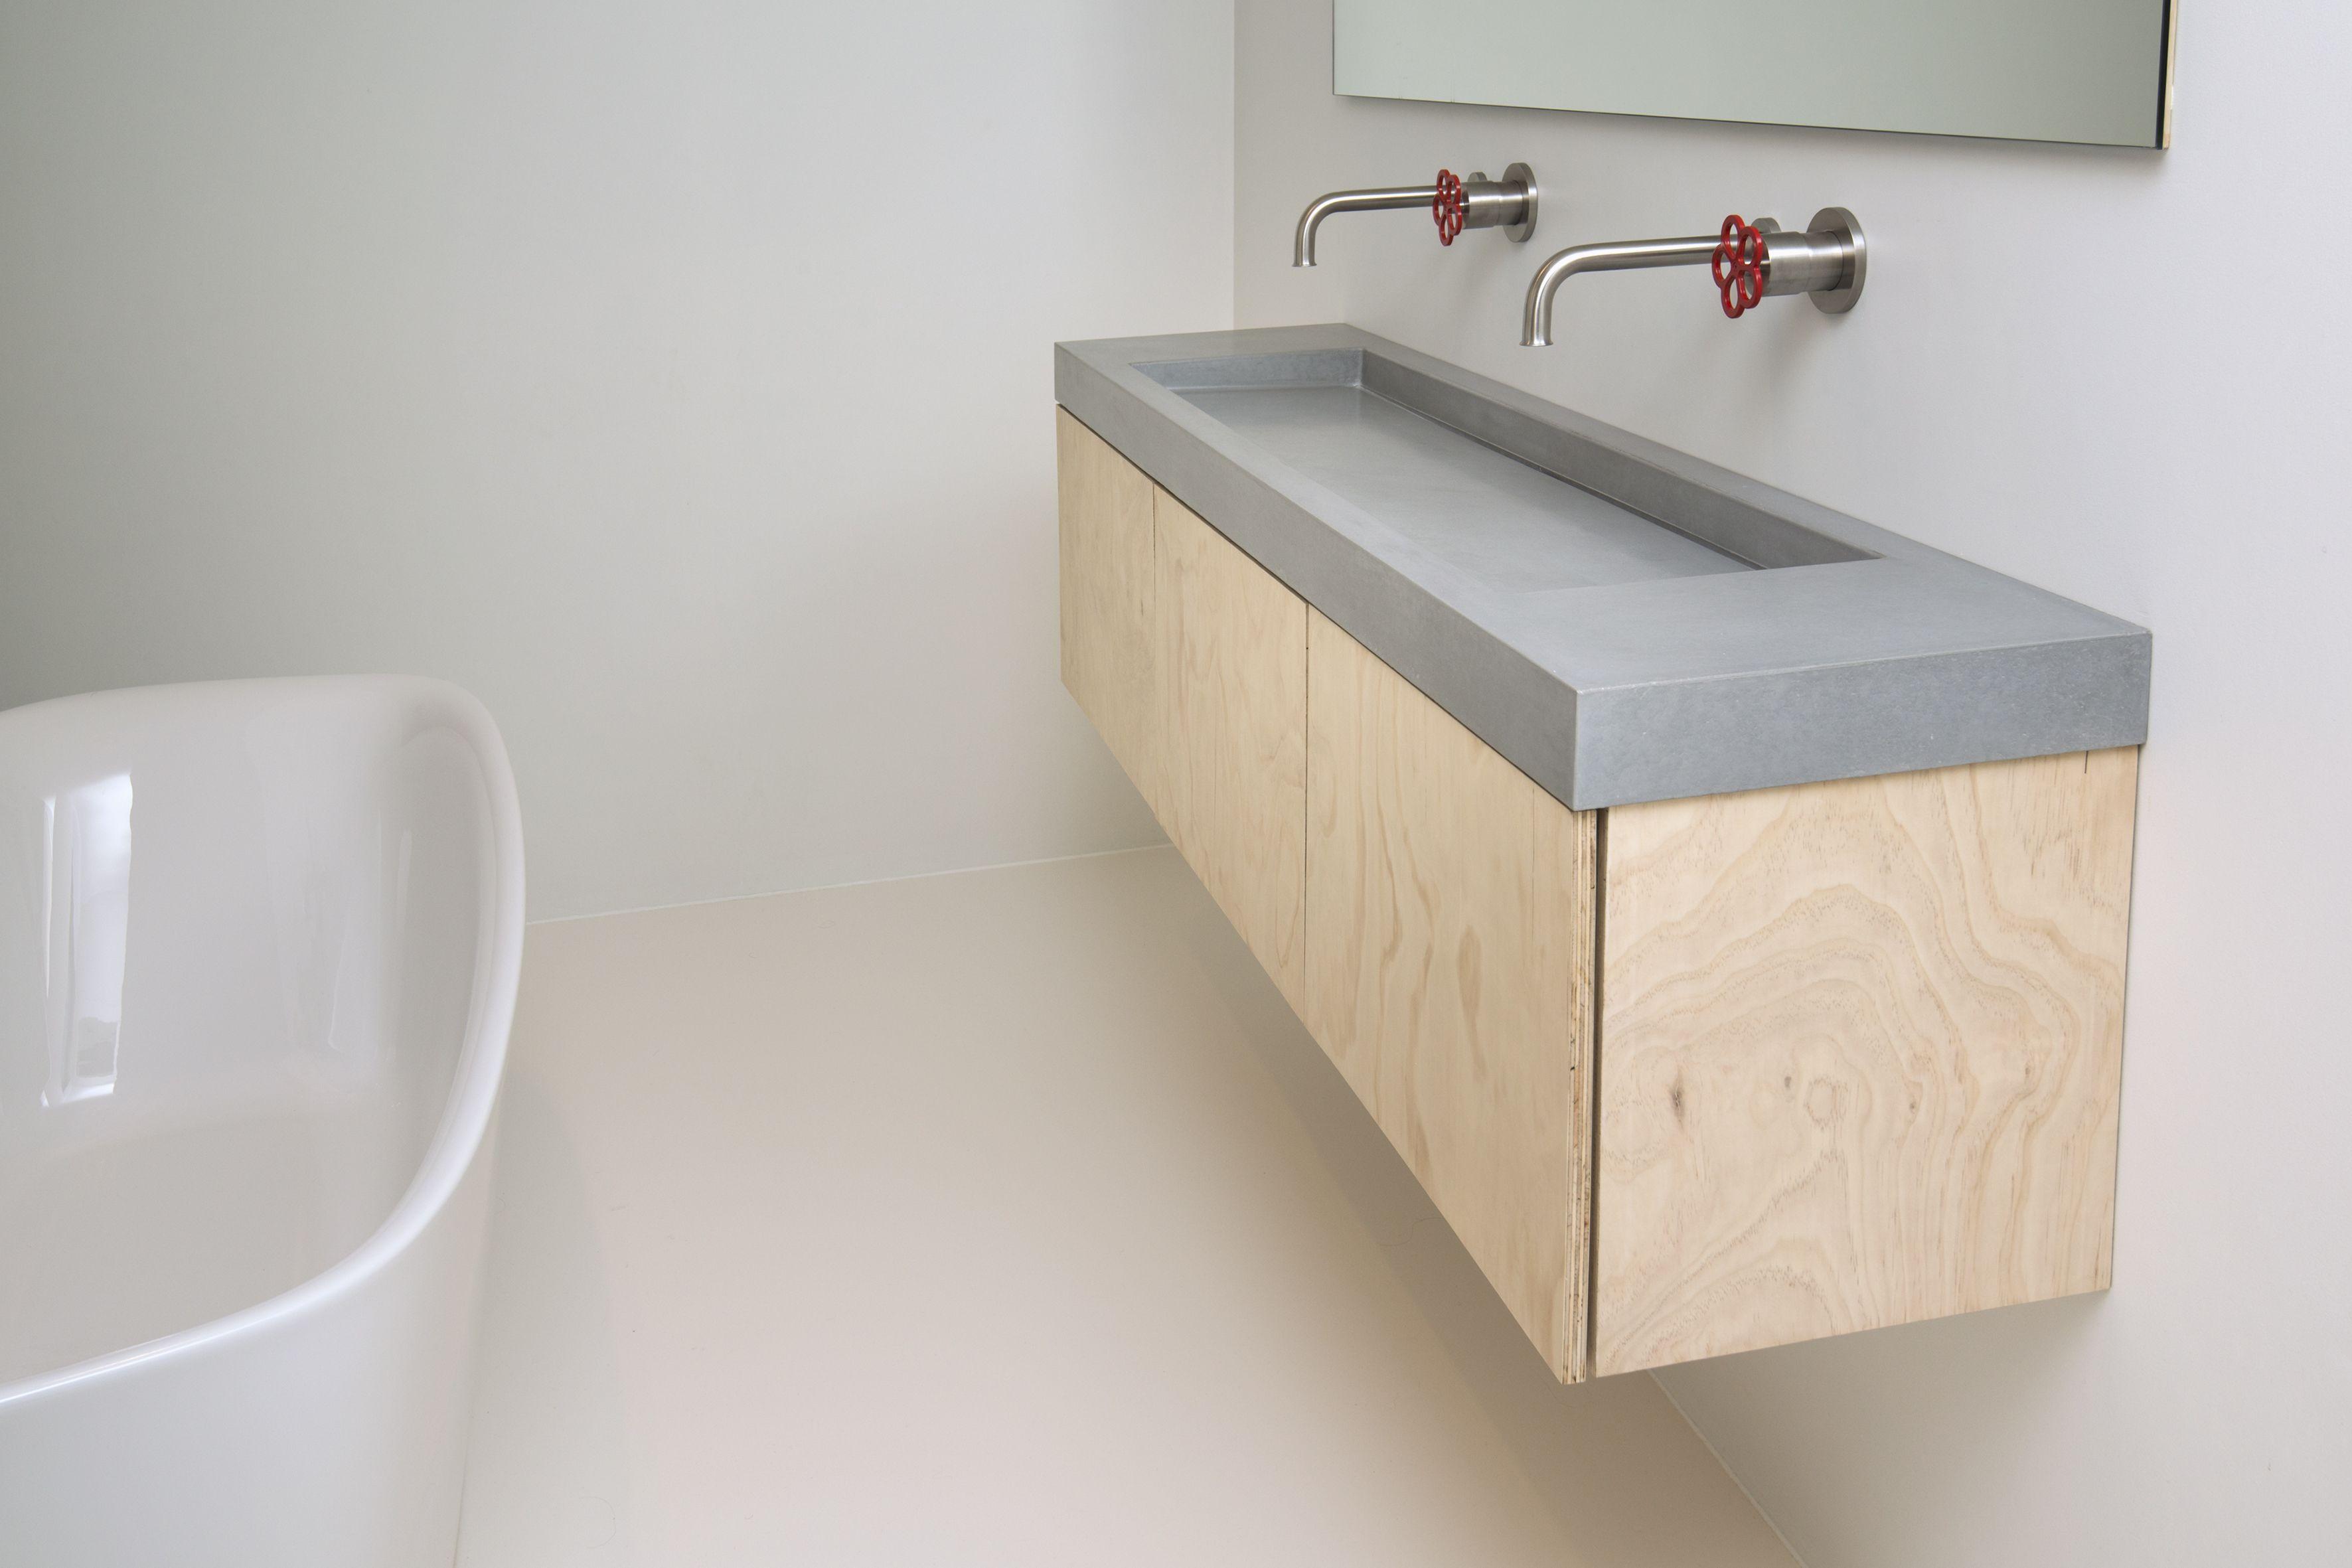 Houten Onderkast Badkamer : Badkamer betonnen wasbak met houten onderkast bathing places